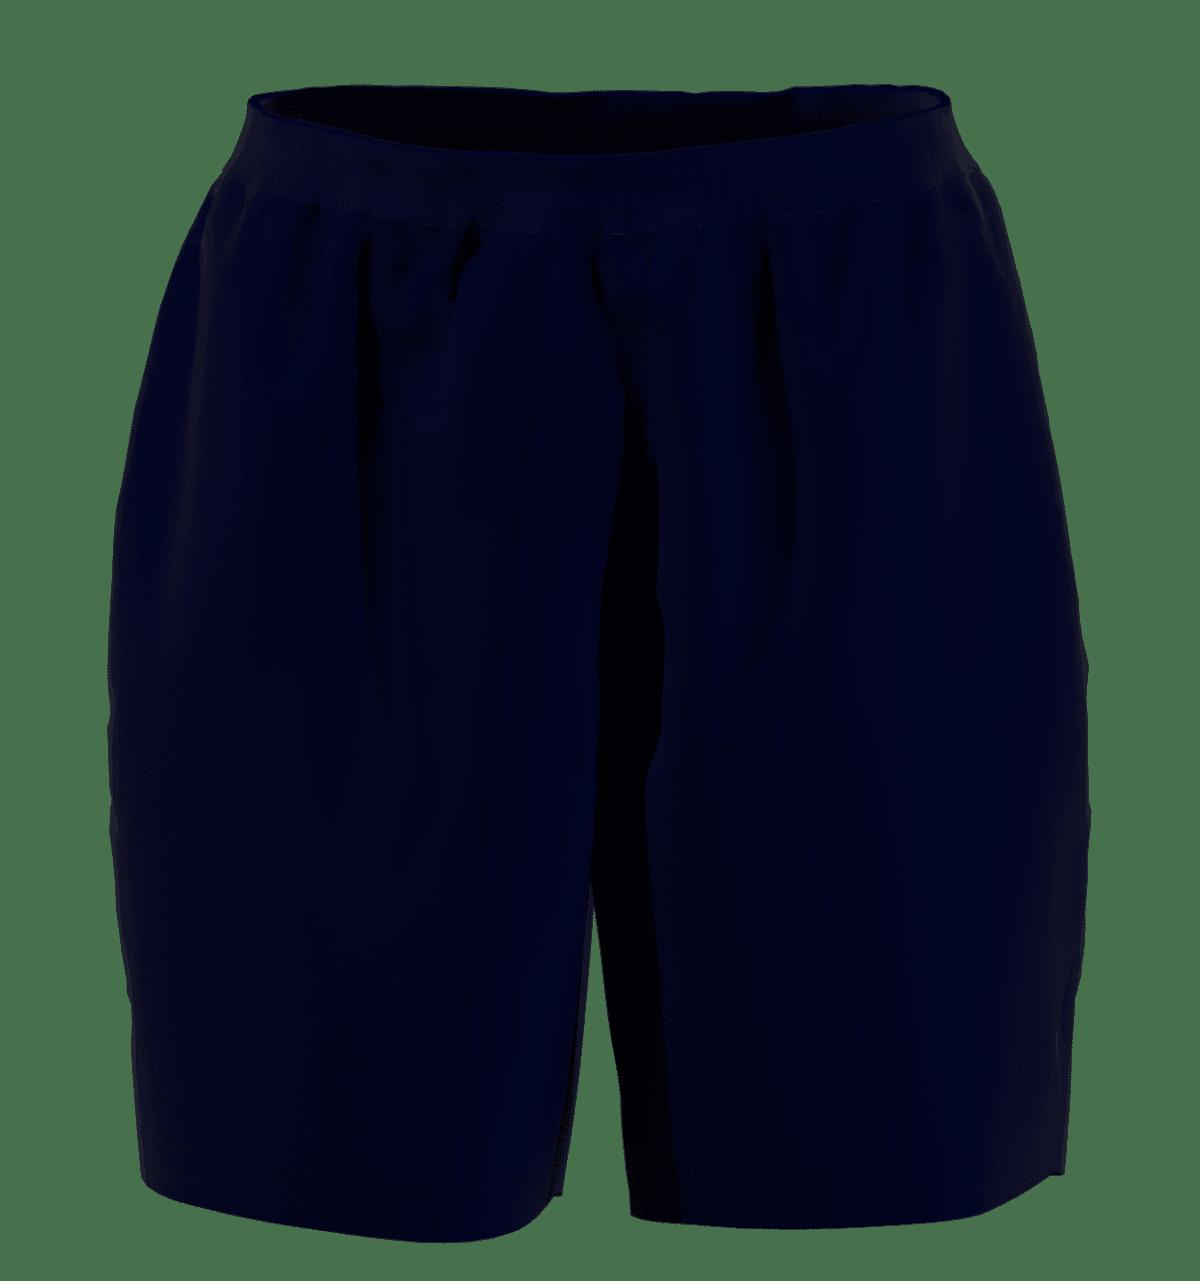 unisex sport shorts men 3d navy